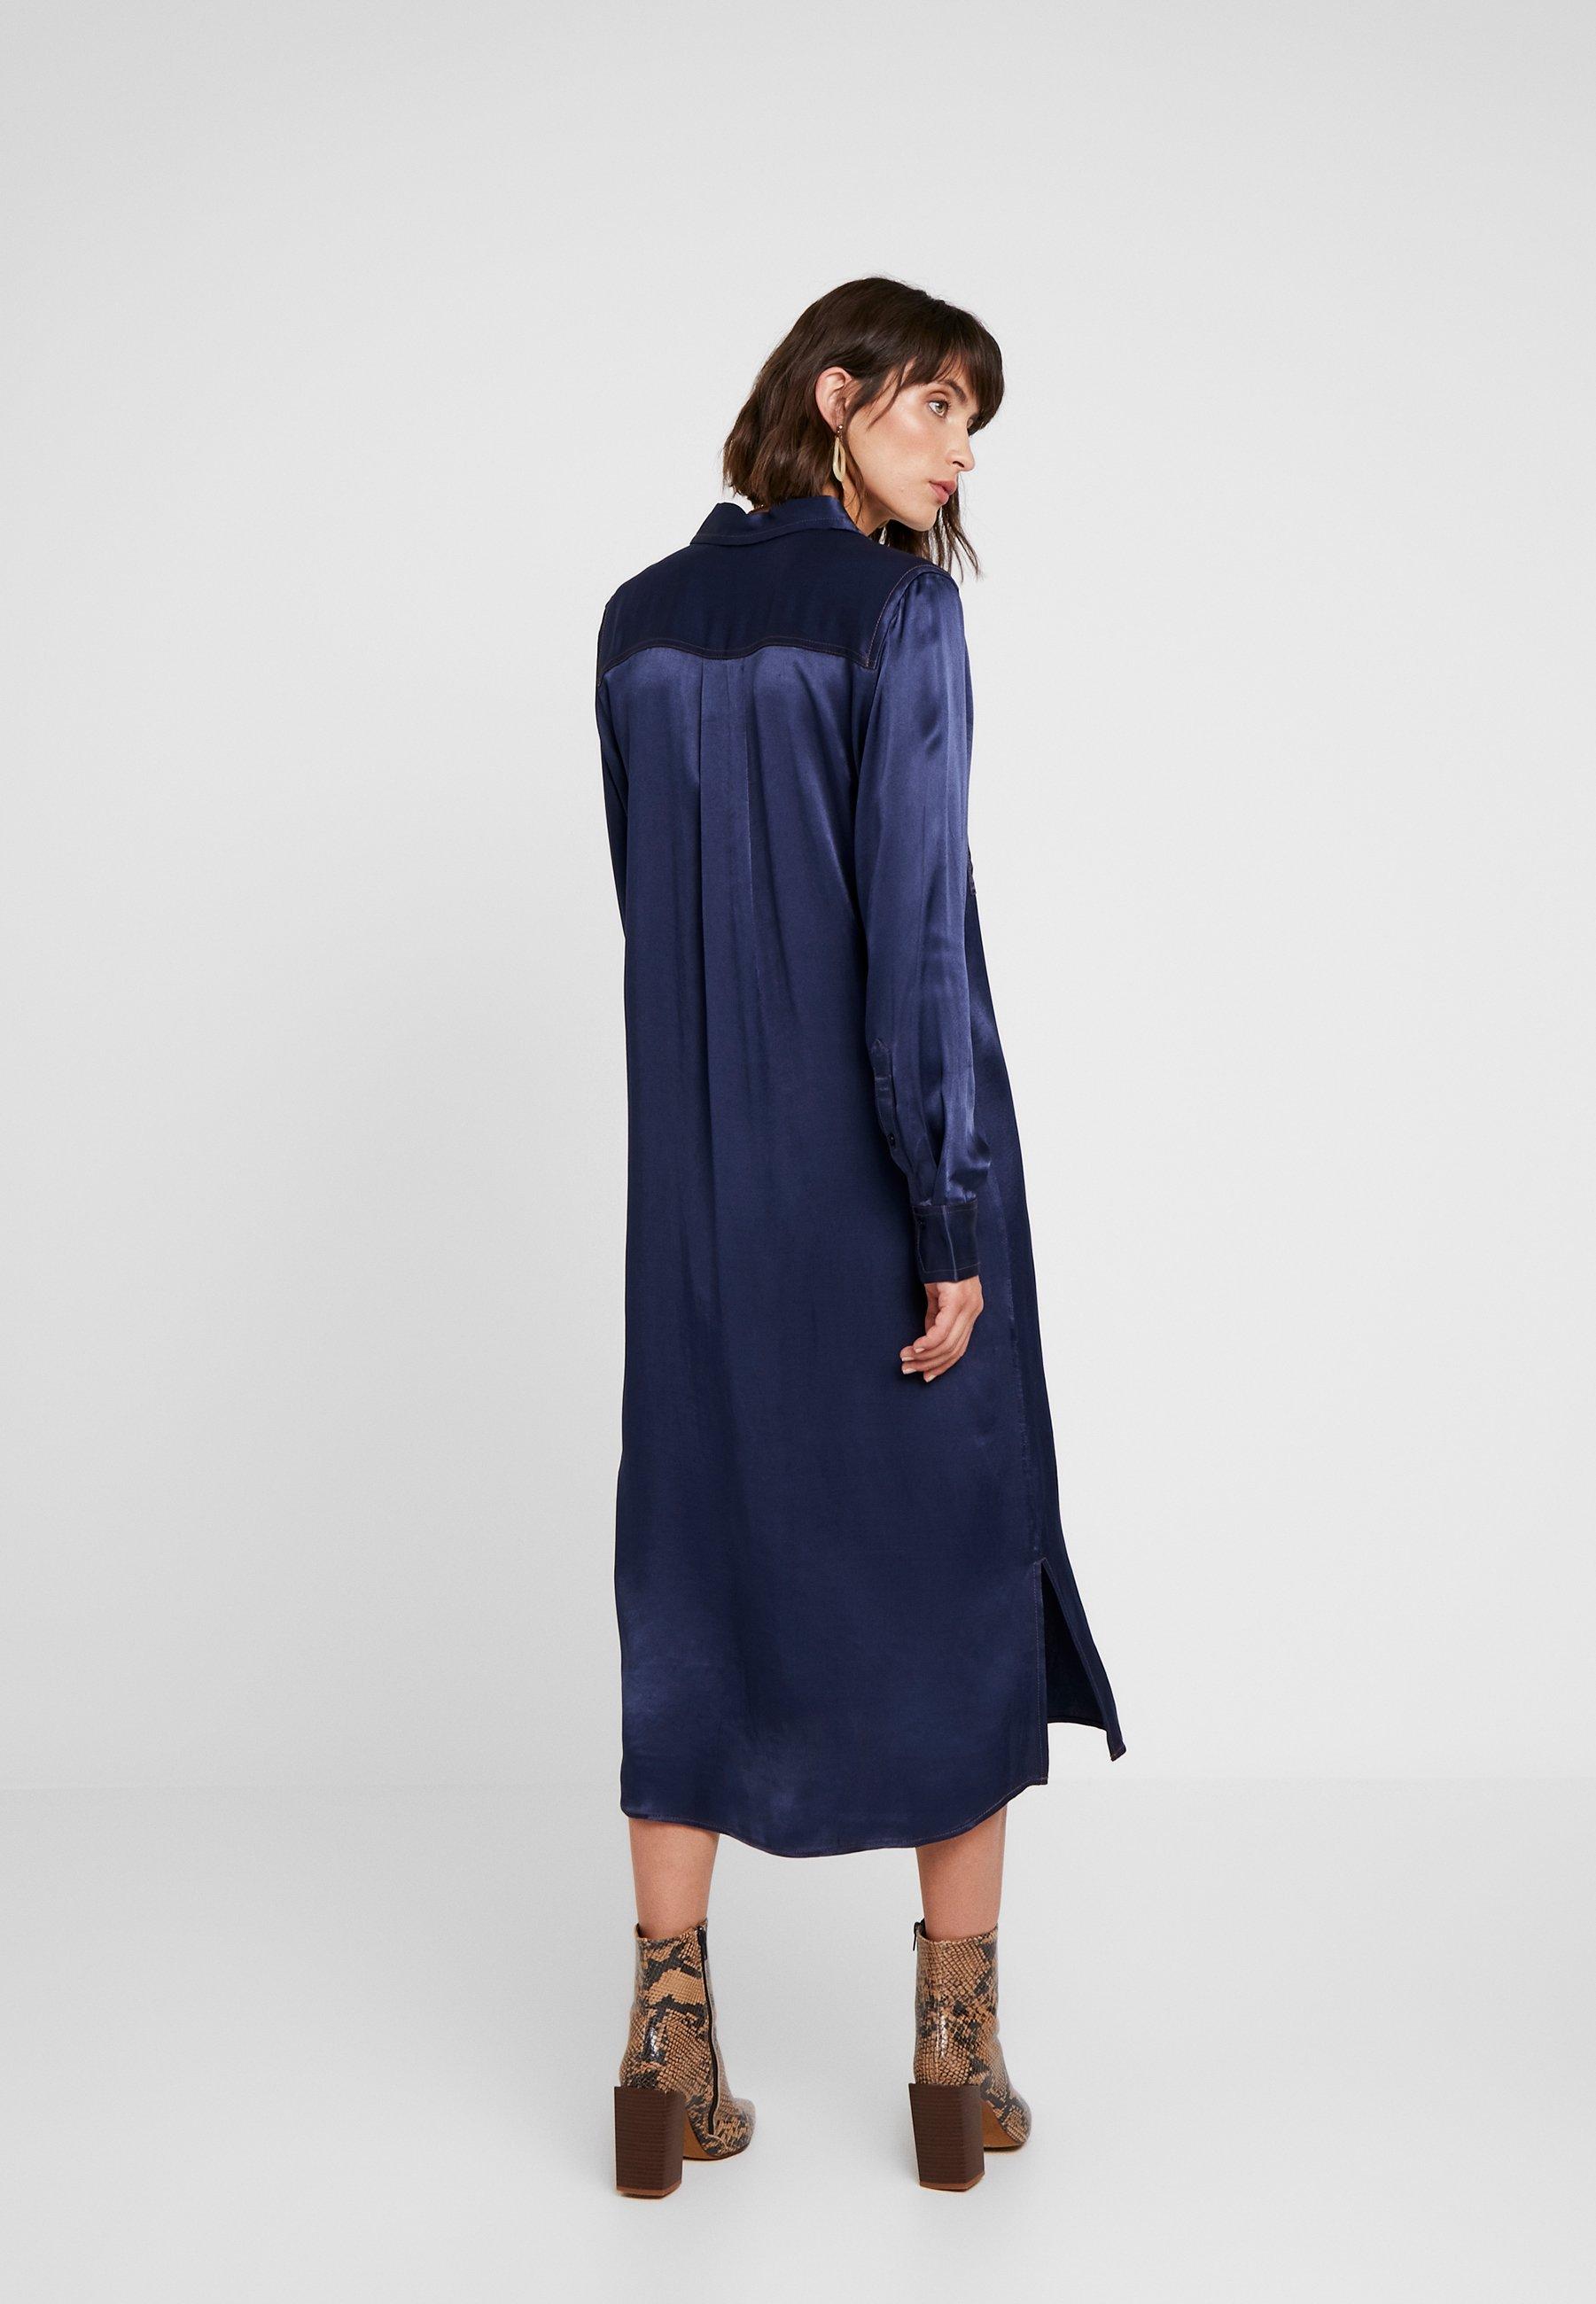 FlorenceAbito Camicia Dress A Levete Room Blues 29YWEIDH